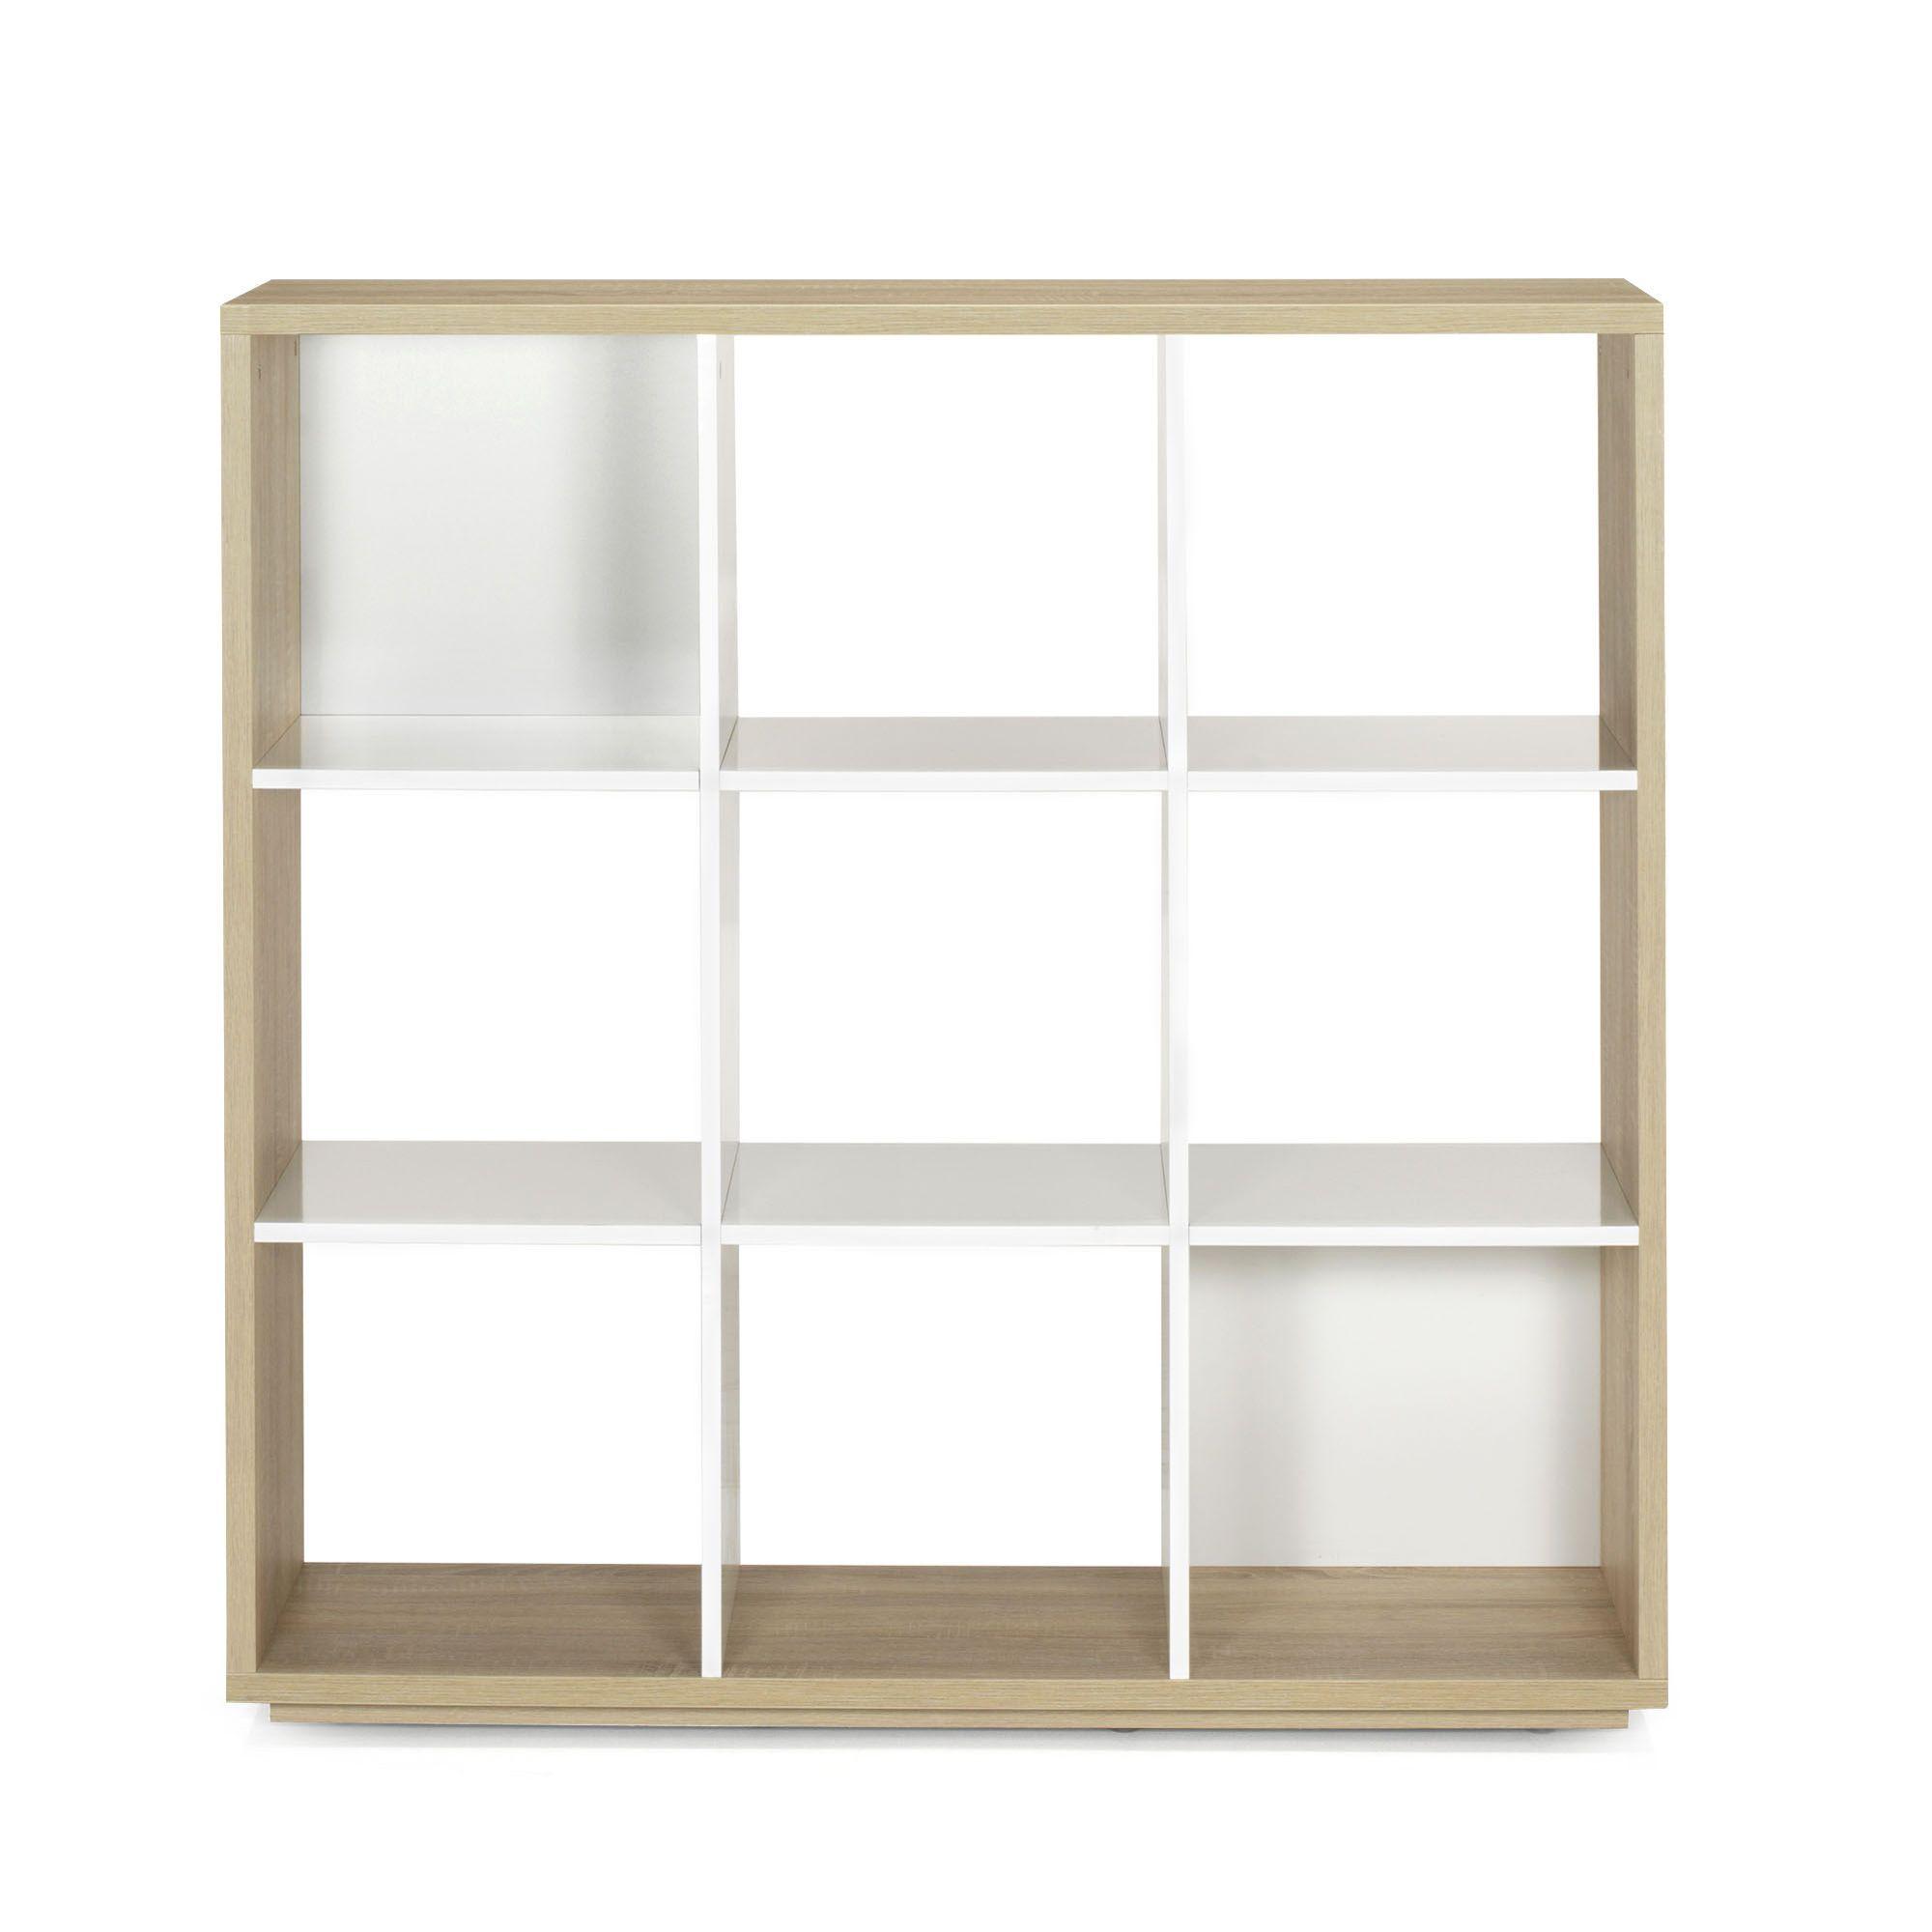 bibliothque 9 cases design scandinave chneblanc checker alina